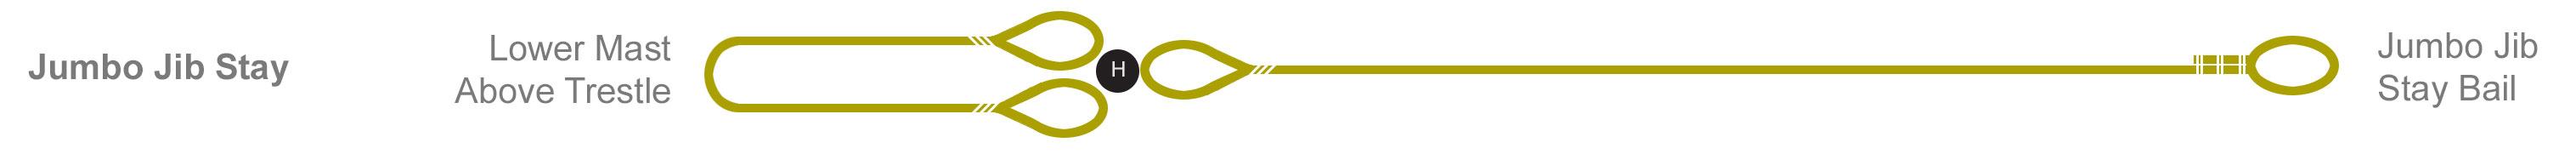 jumbo-jib-layout